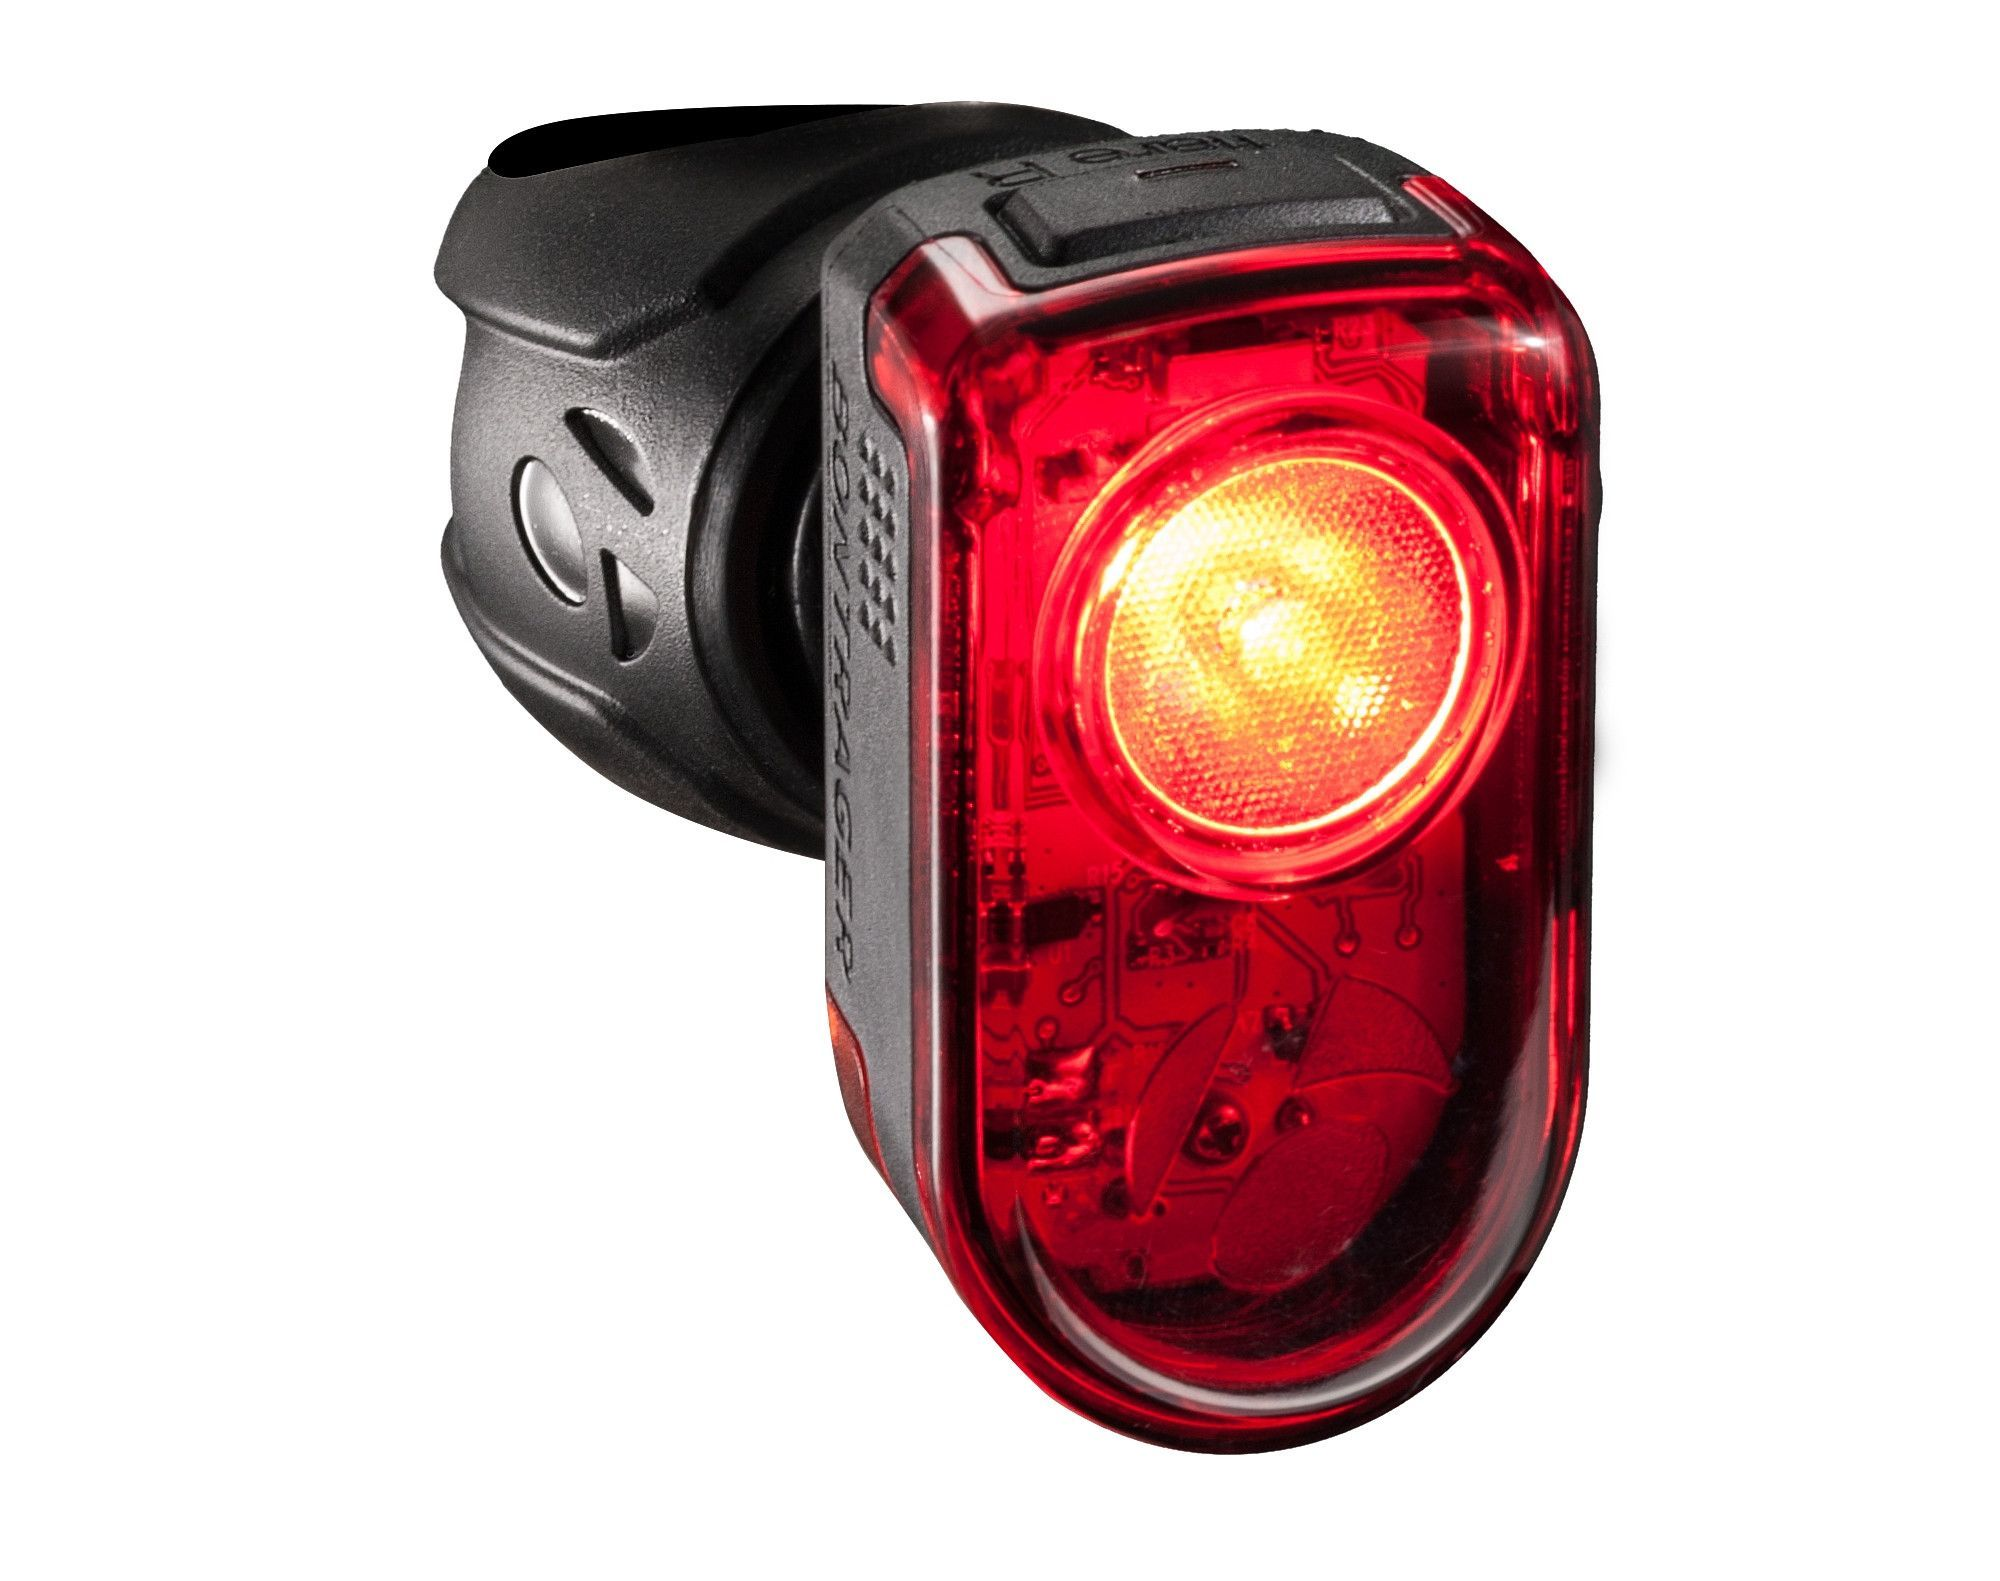 Bontrager Flare R Tail Light Usb Rechargable 65 Lumens Rear Bike Light Bike Lights Bike Tail Light